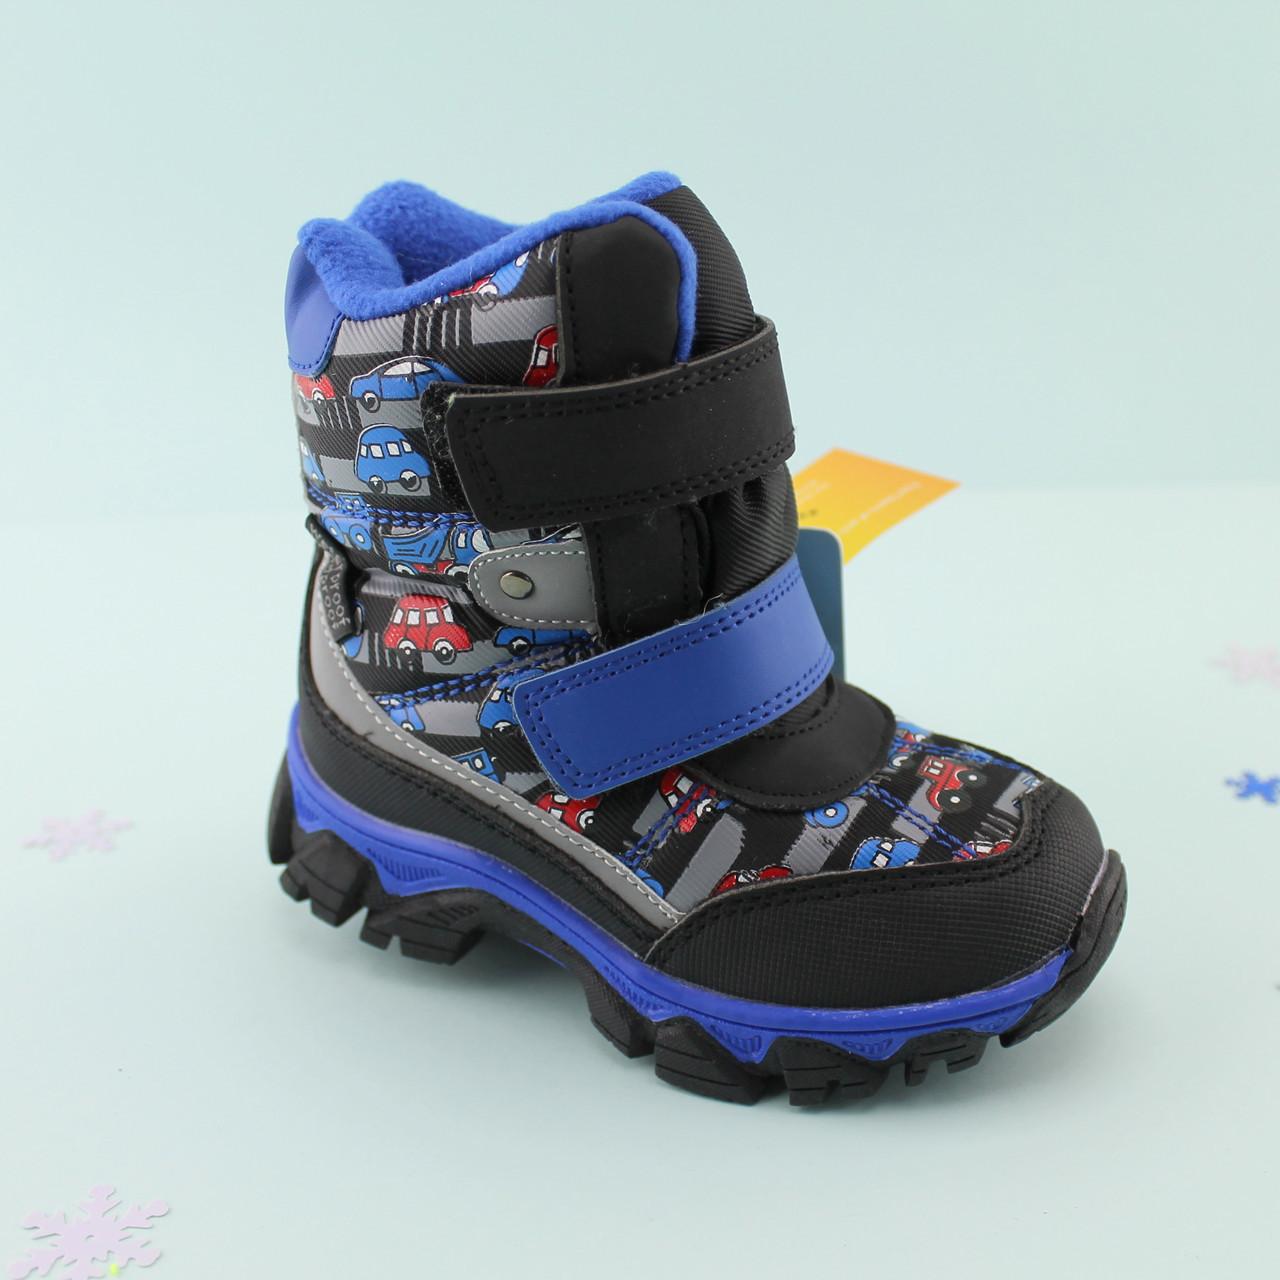 d367dfdd7 Термо ботинки на овчине для мальчика Том.м размер 27 - BonKids - детский  магазин